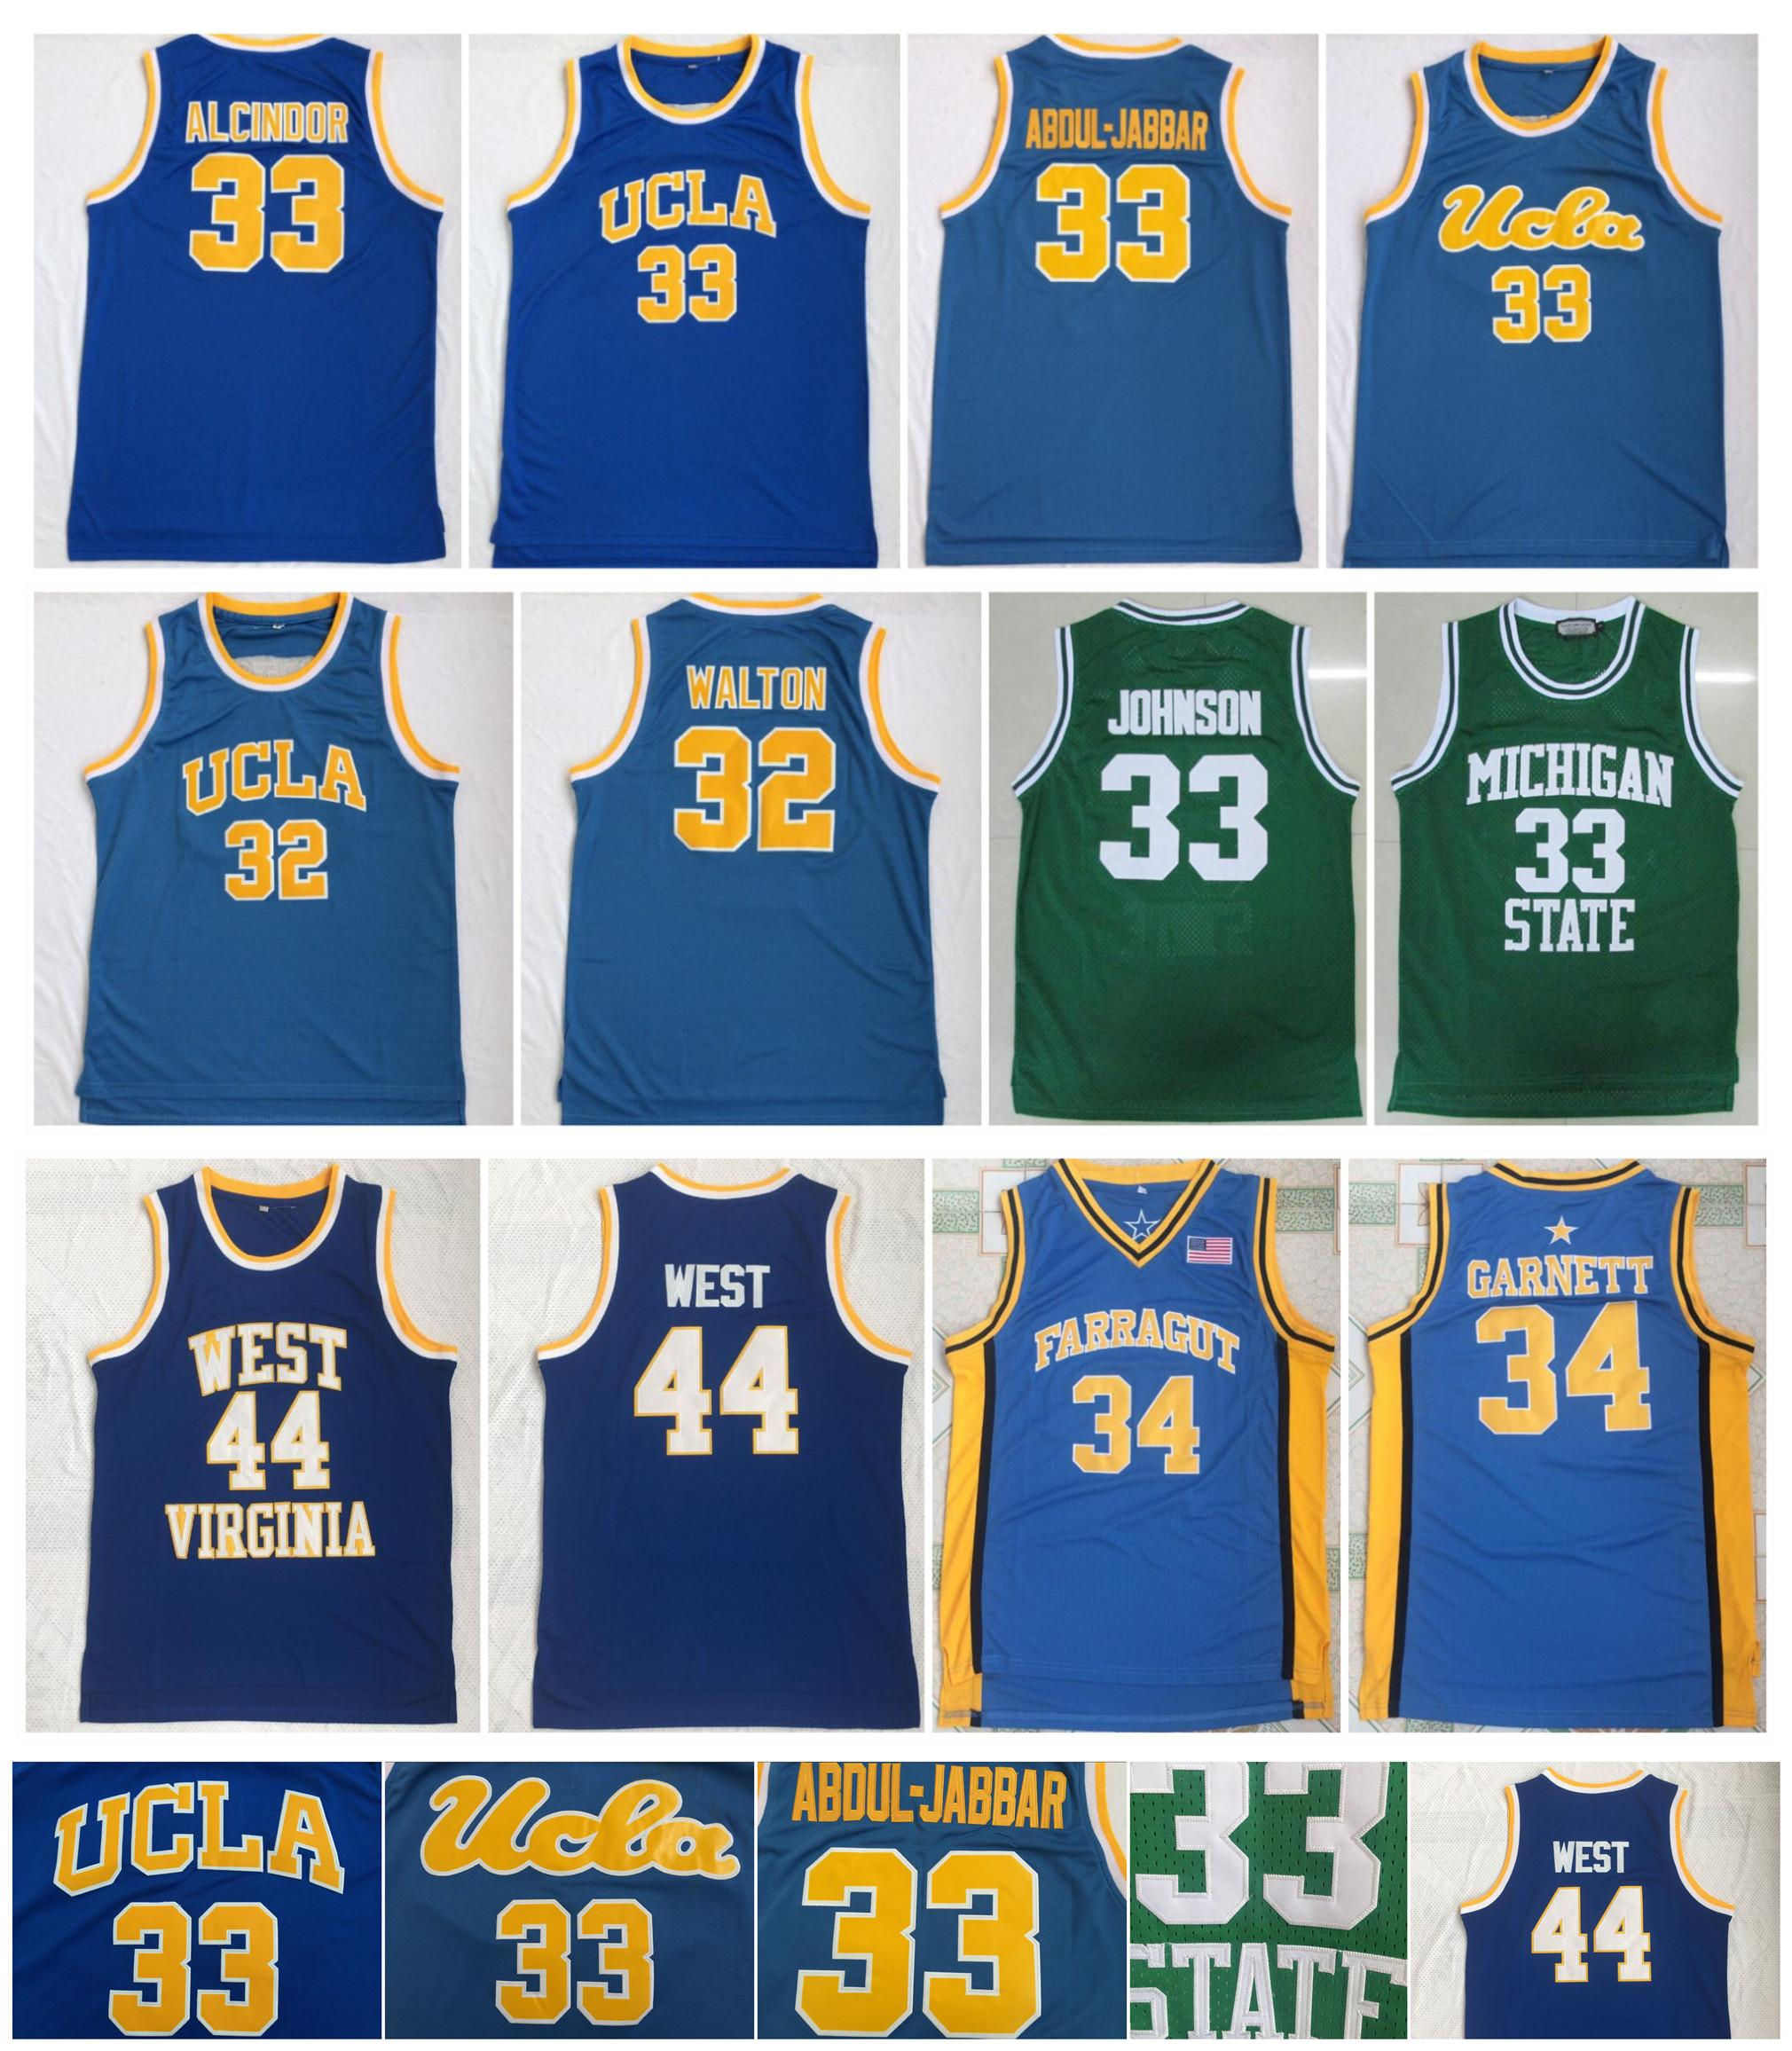 NCAA College Basketball Jerseys Kareem Abdul Jabbar UCLA Bruins Jersey Bill WALTON Michigan Earvin Johnson Jerry West Kevin Garnett Virginia